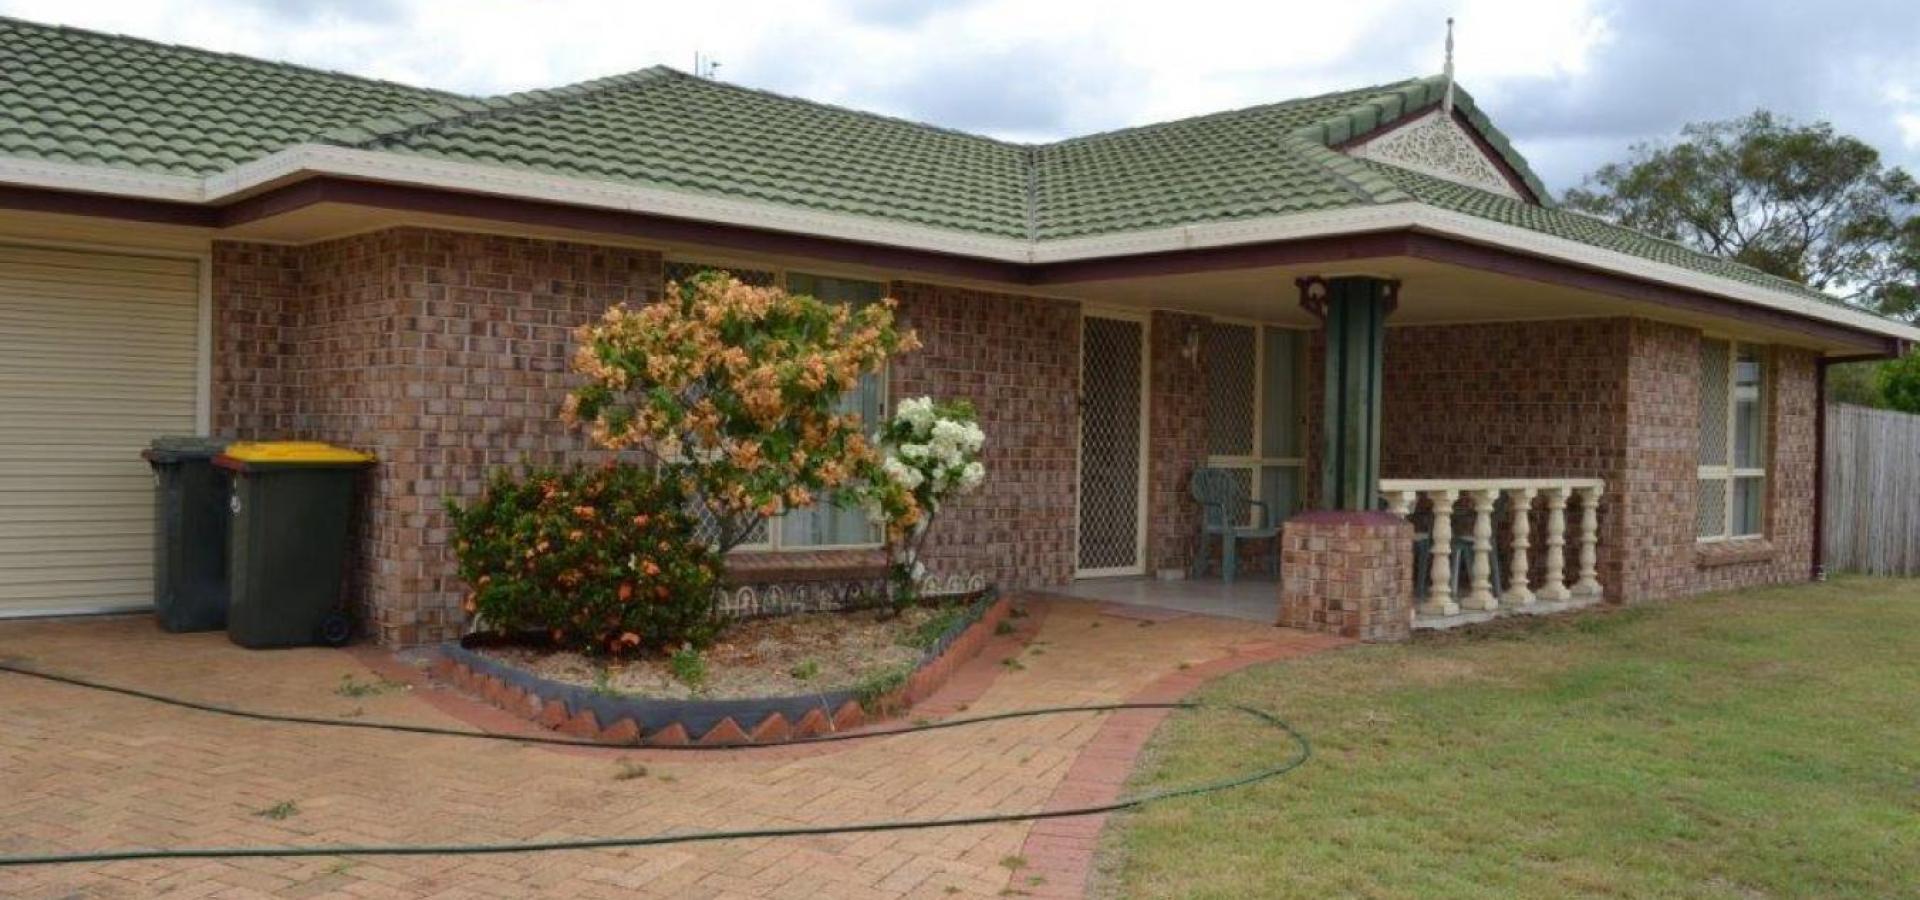 STYLISH EX-DISPLAY HOME, 3 BEDROOM BRICK AND TILE ON A LEVEL 688m2 CORNER BLOCK IN CARARA DRIVE, KAWANA